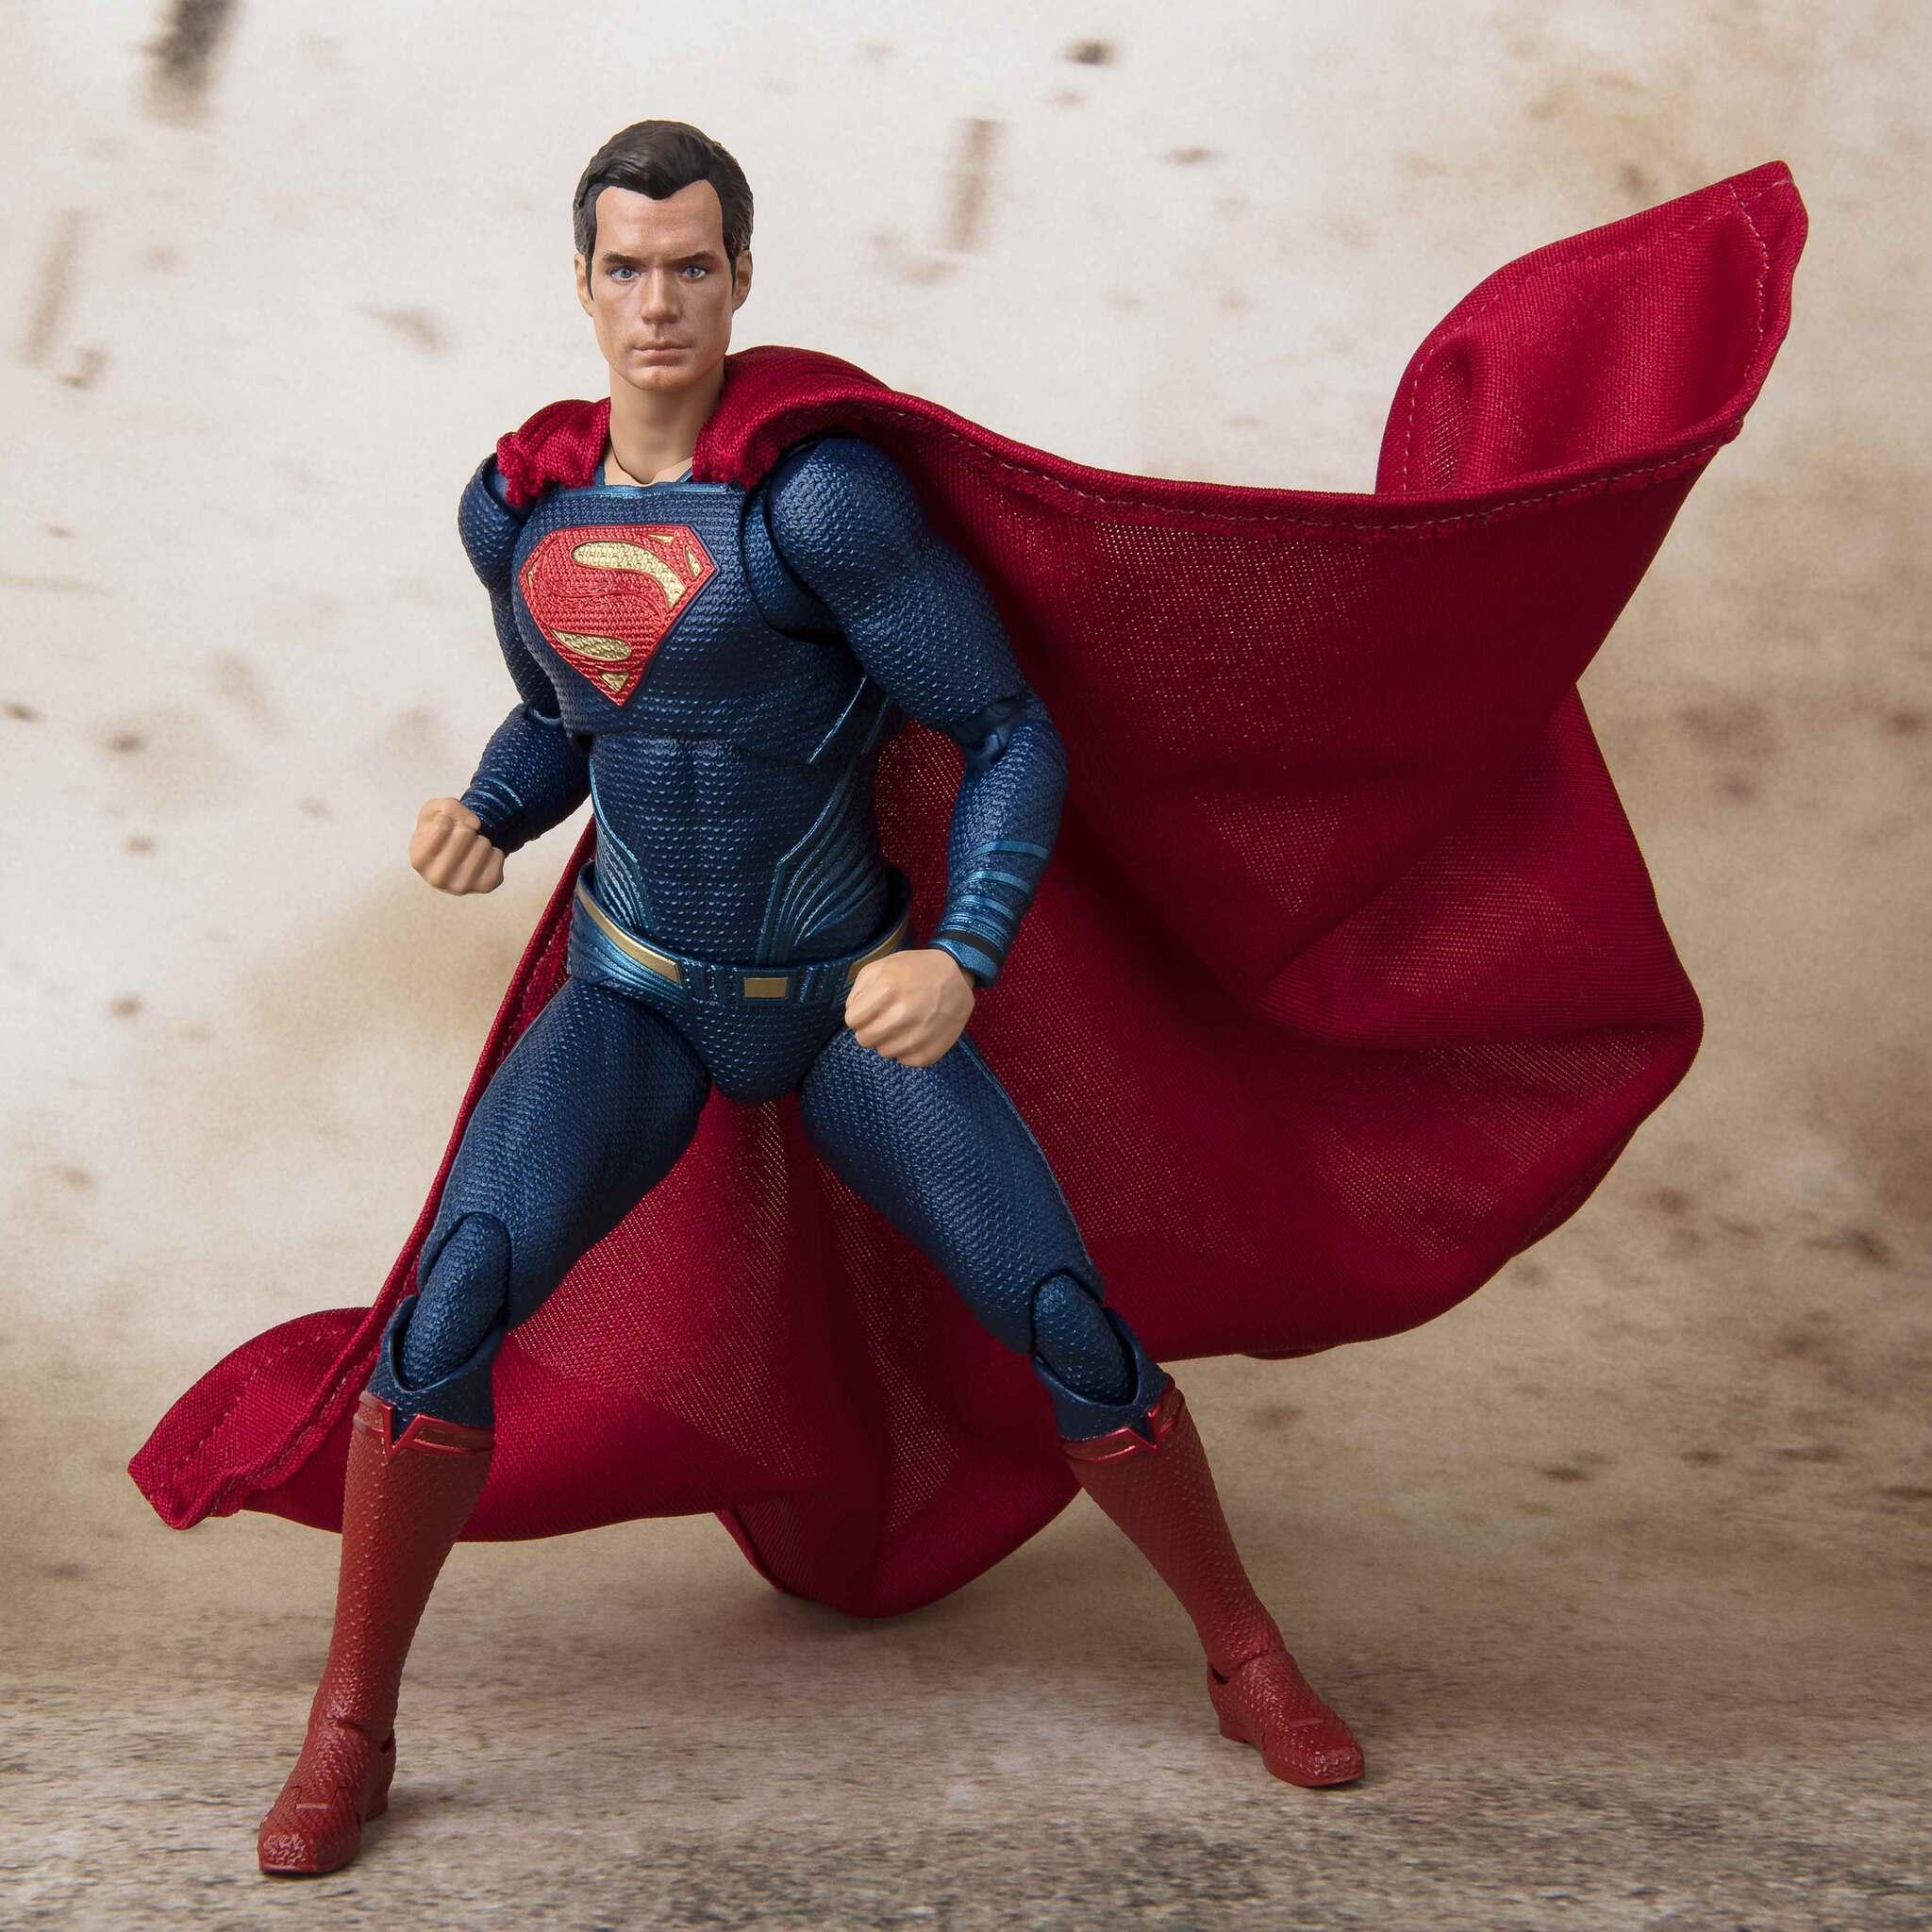 superman-justice-league-toy-vm.jpg